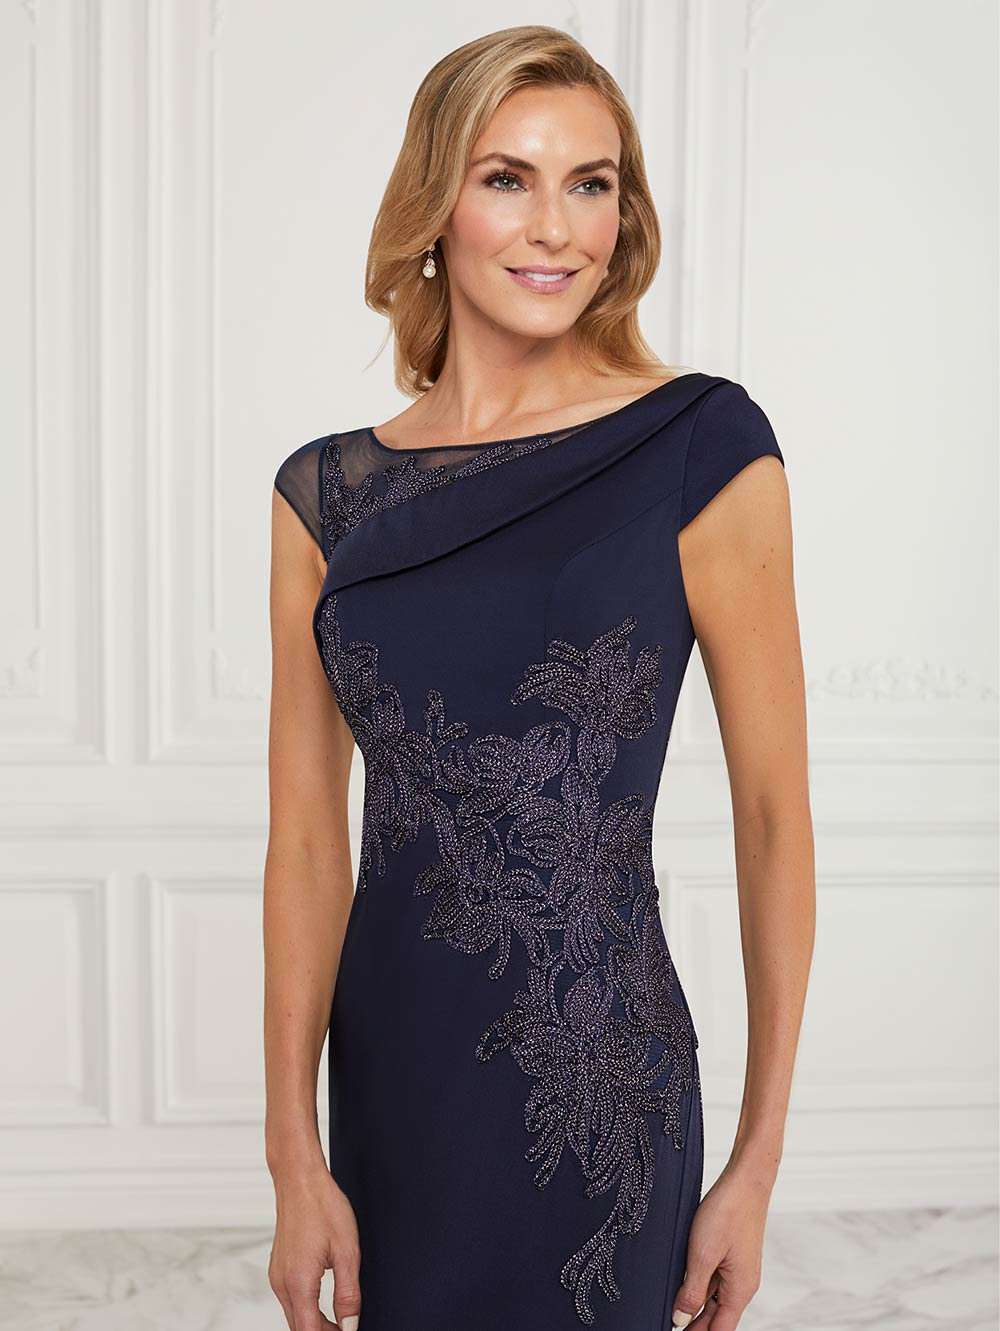 special-occasion-dresses-jacquelin-bridals-canada-27701